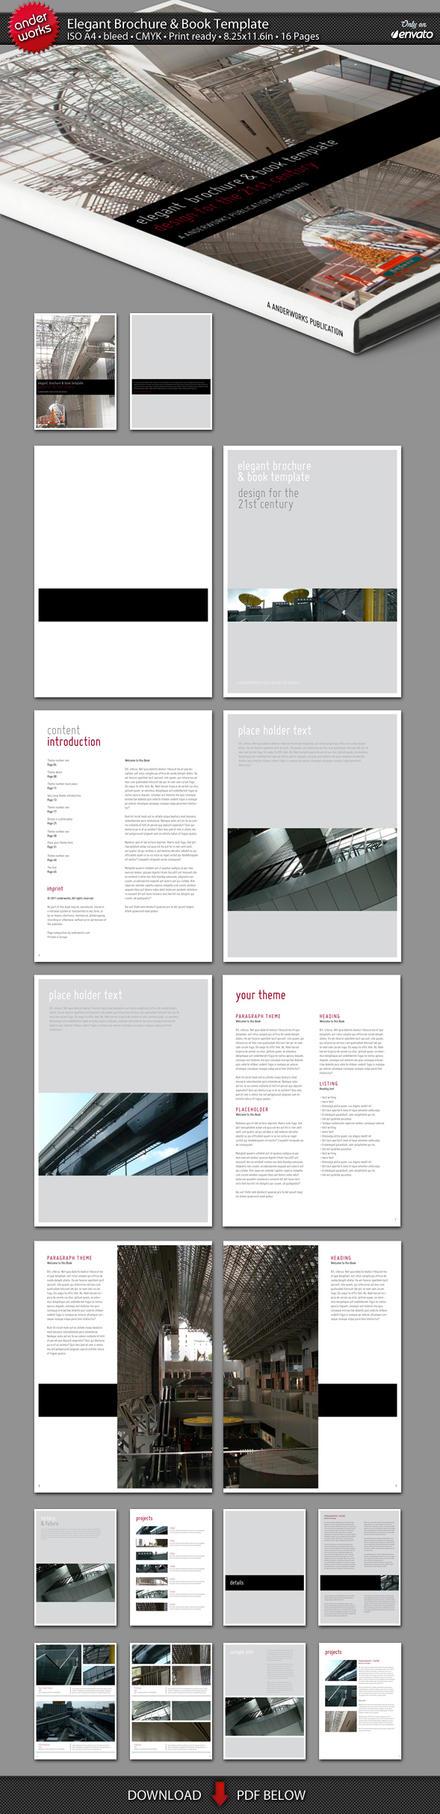 elegant brochure templates - elegant brochure book template by isoarts2 on deviantart